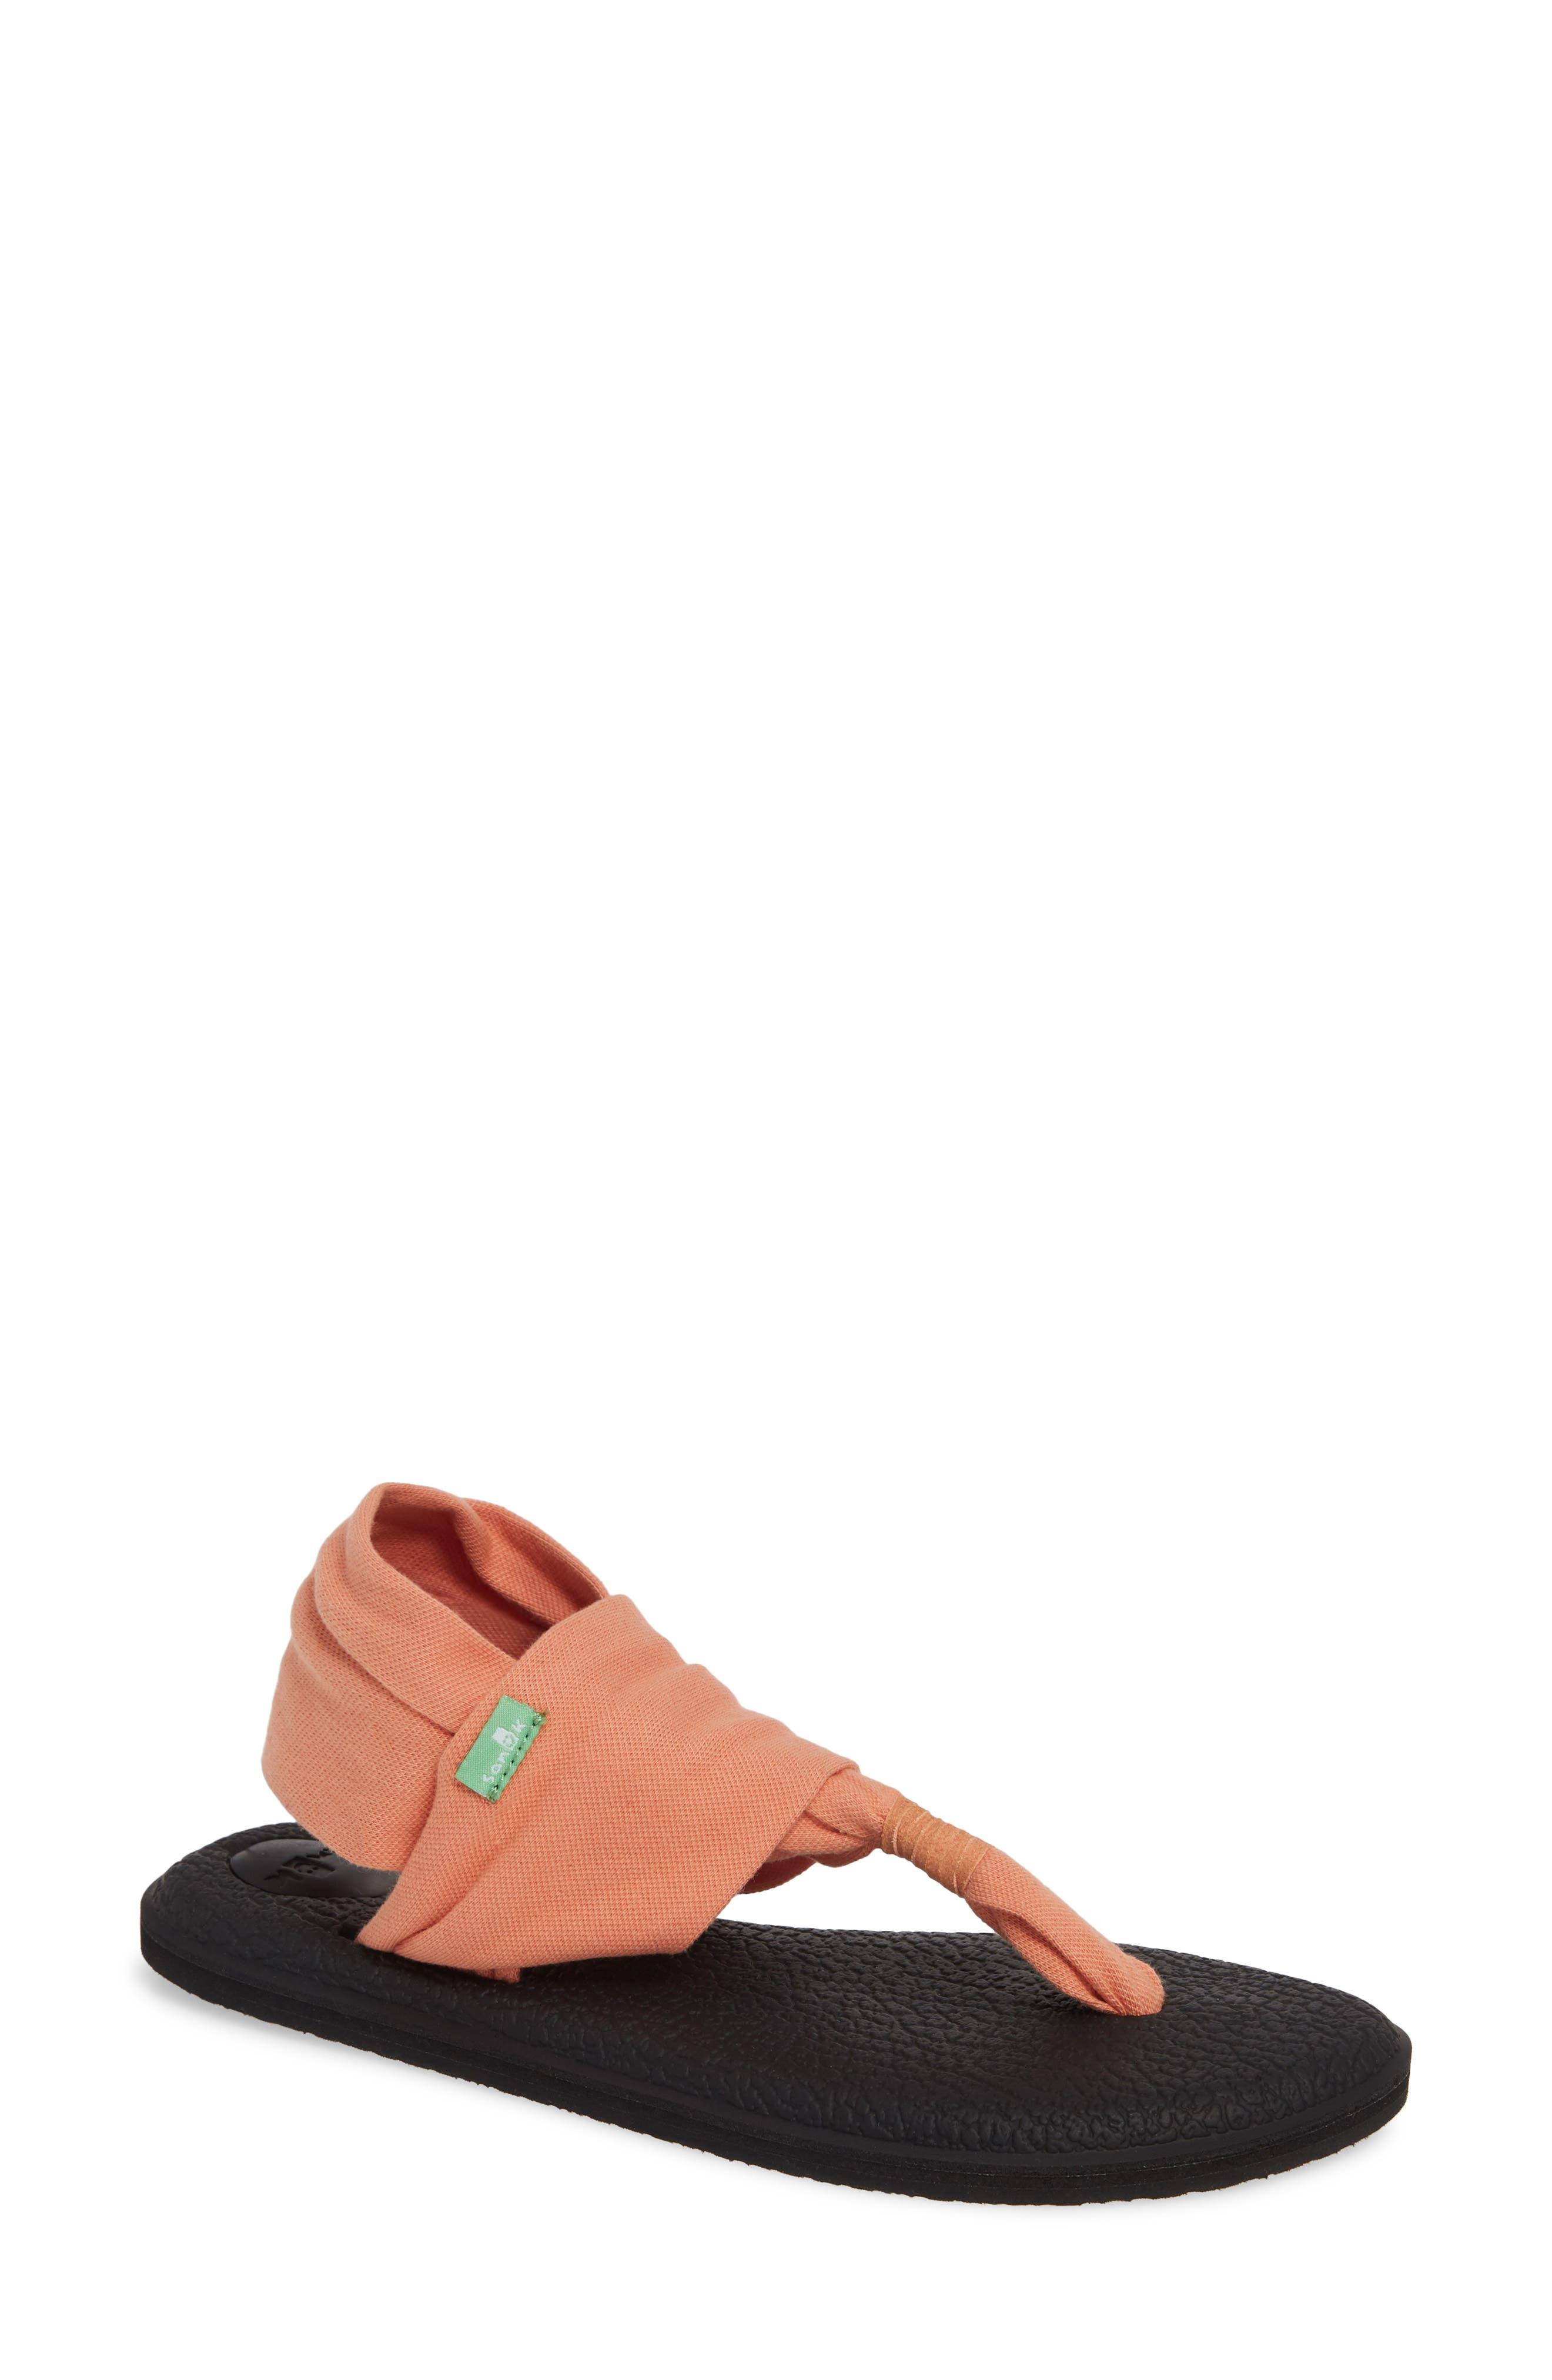 SANUK 'Yoga Sling 2' Sandal, Main, color, CARNELIAN